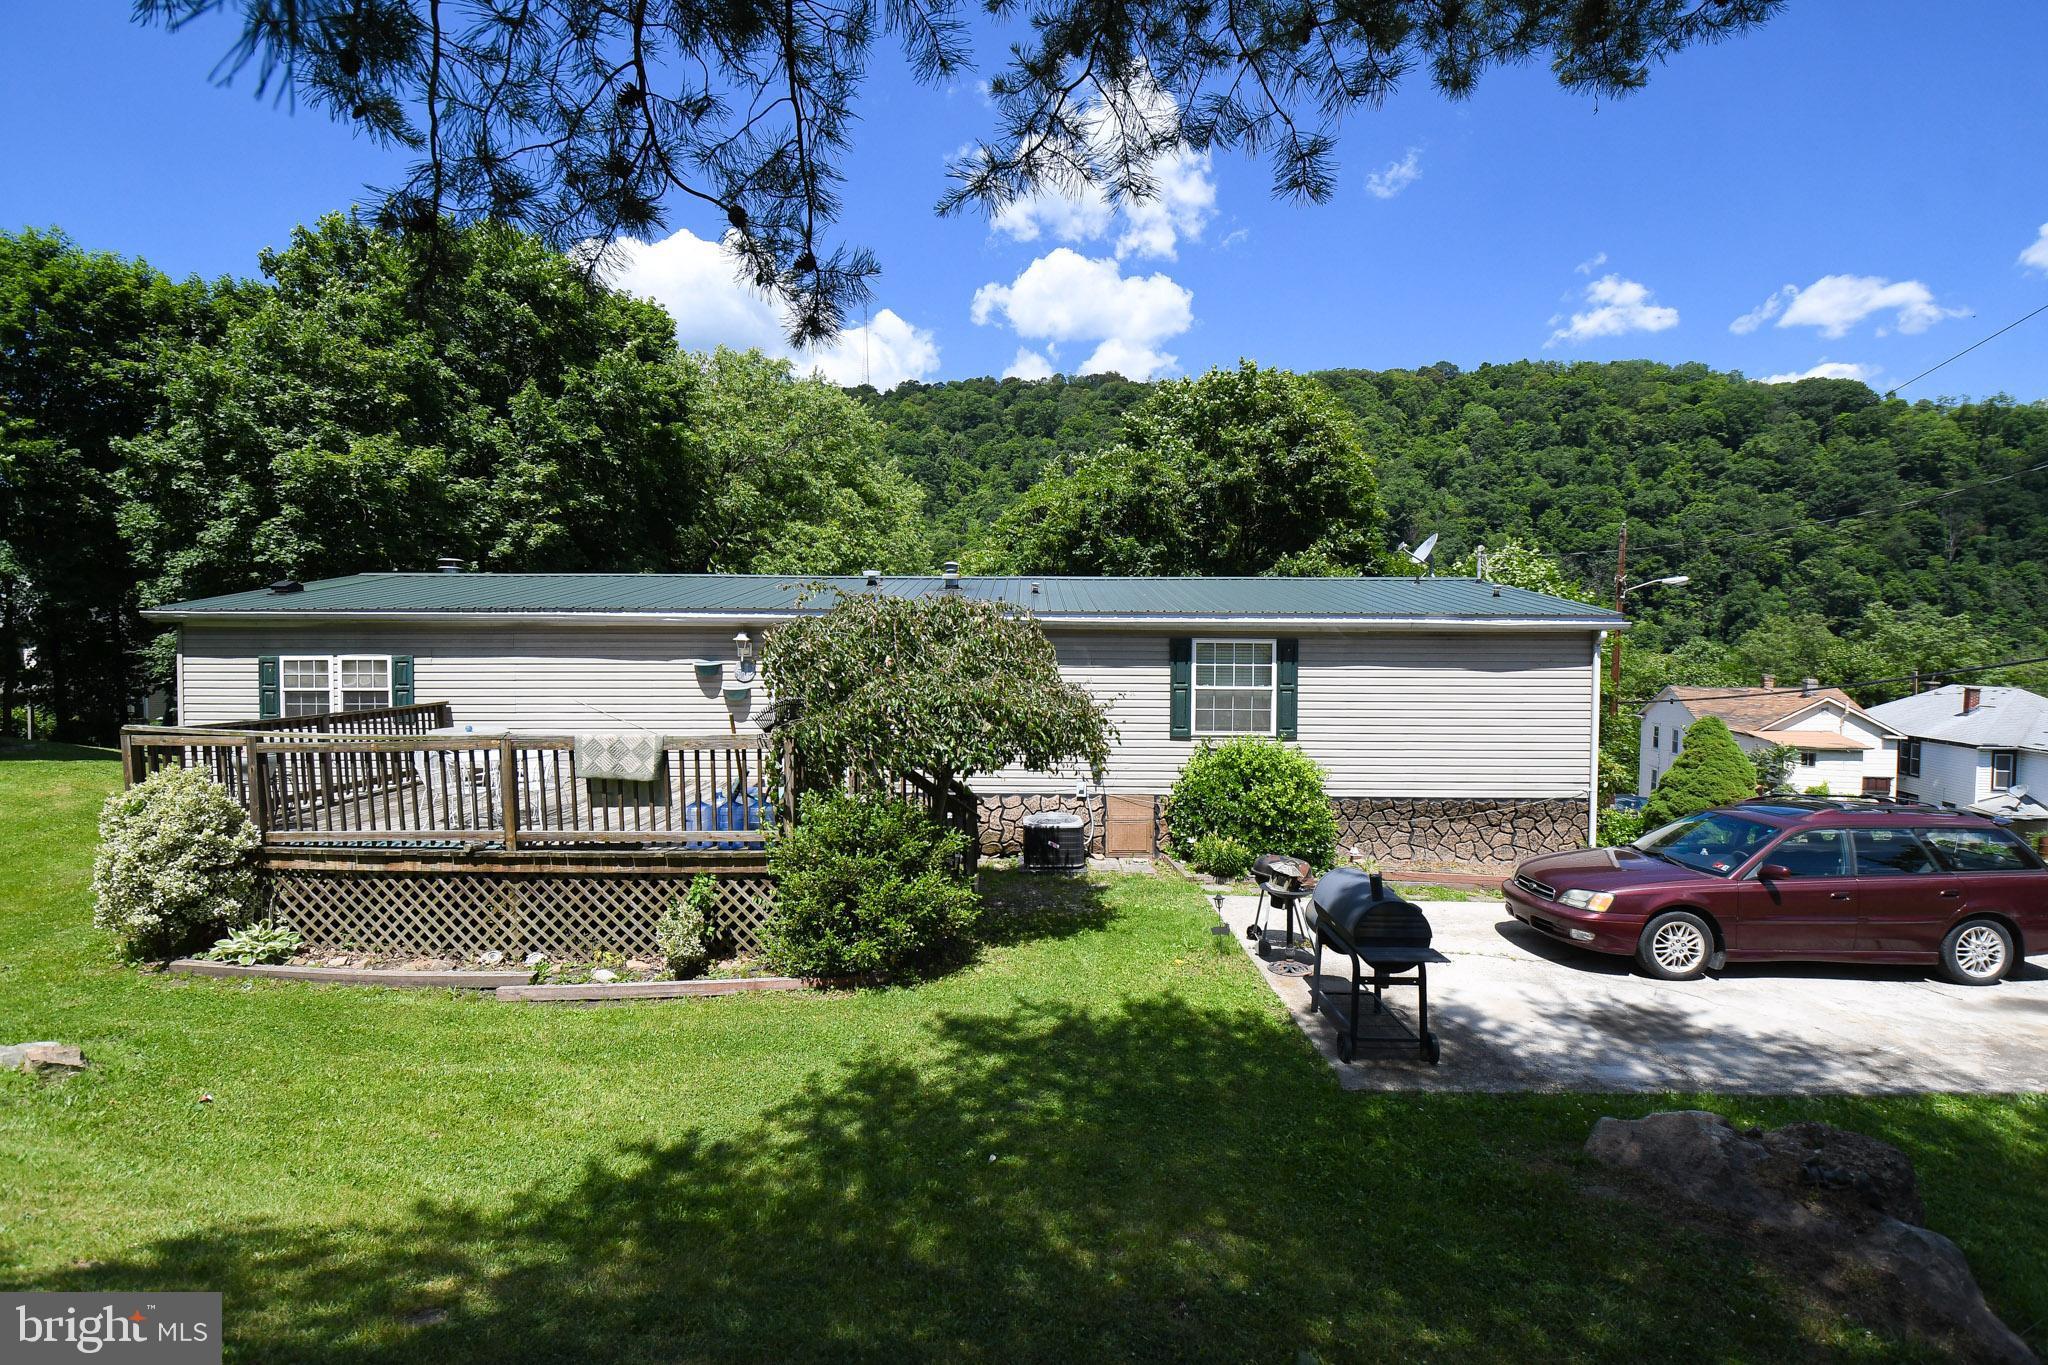 15 Fisher Street, Piedmont, WV 26750